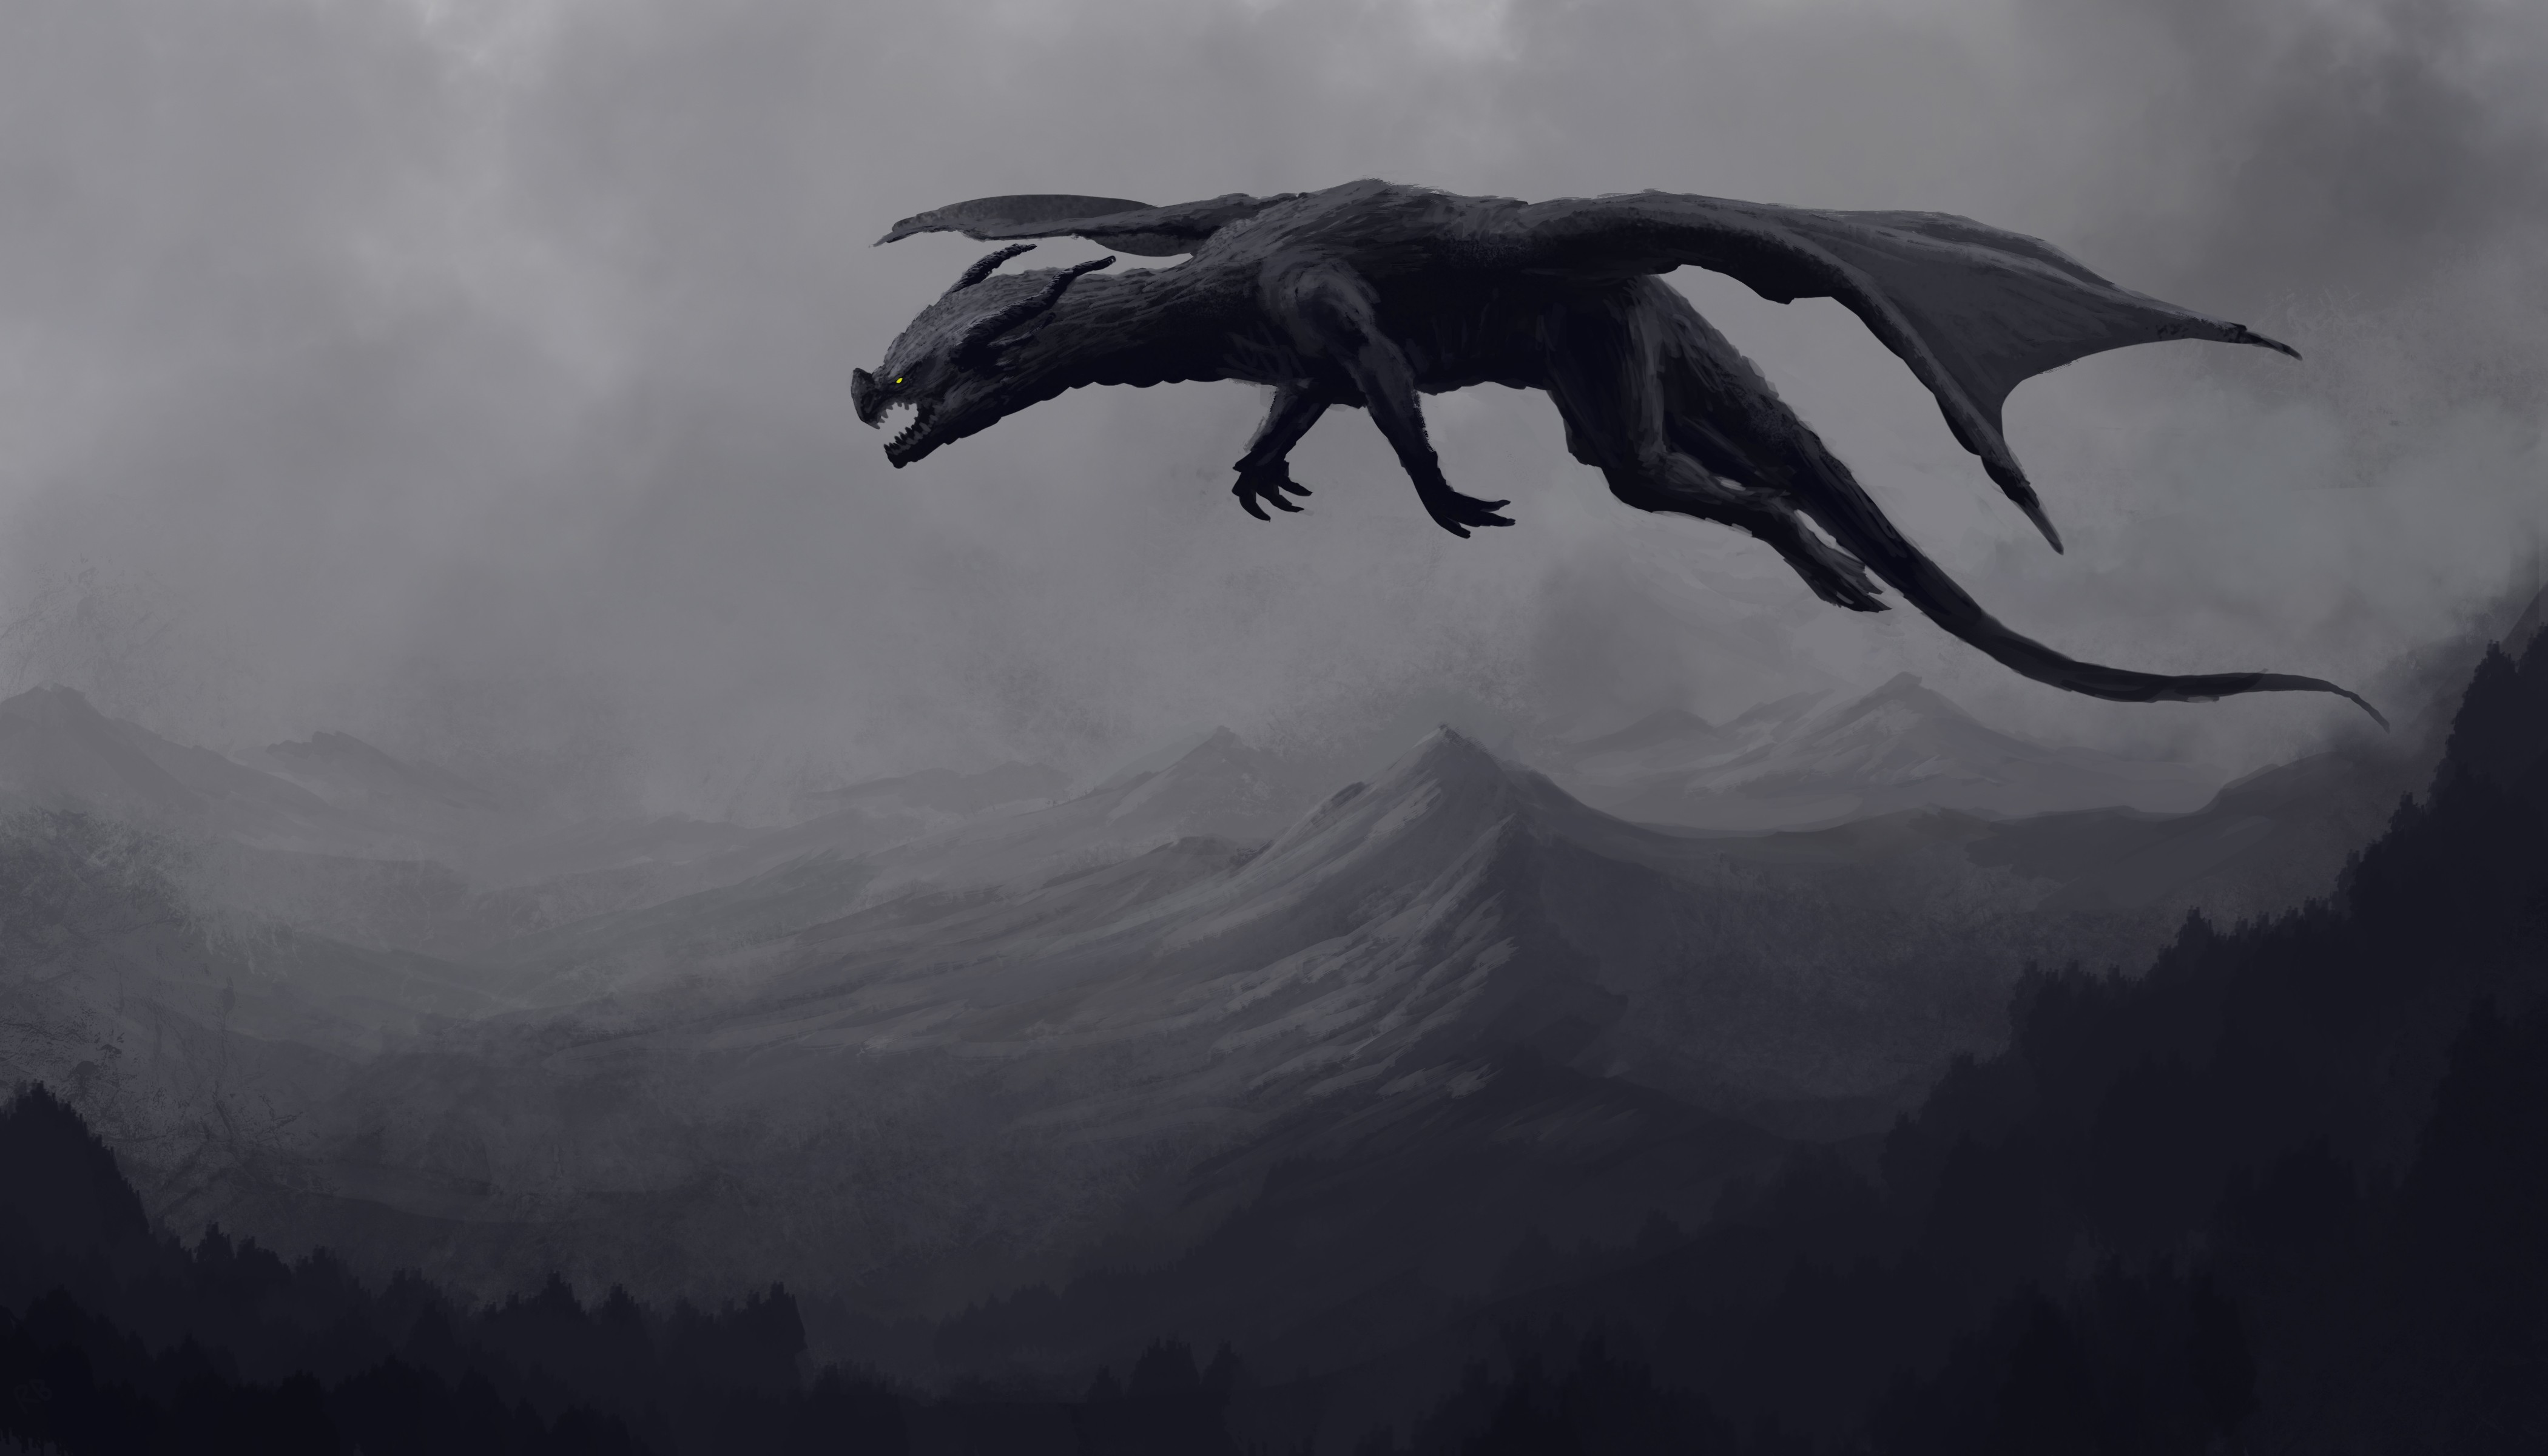 Big Giant Black Dragon 4k, HD Artist, 4k Wallpapers ...